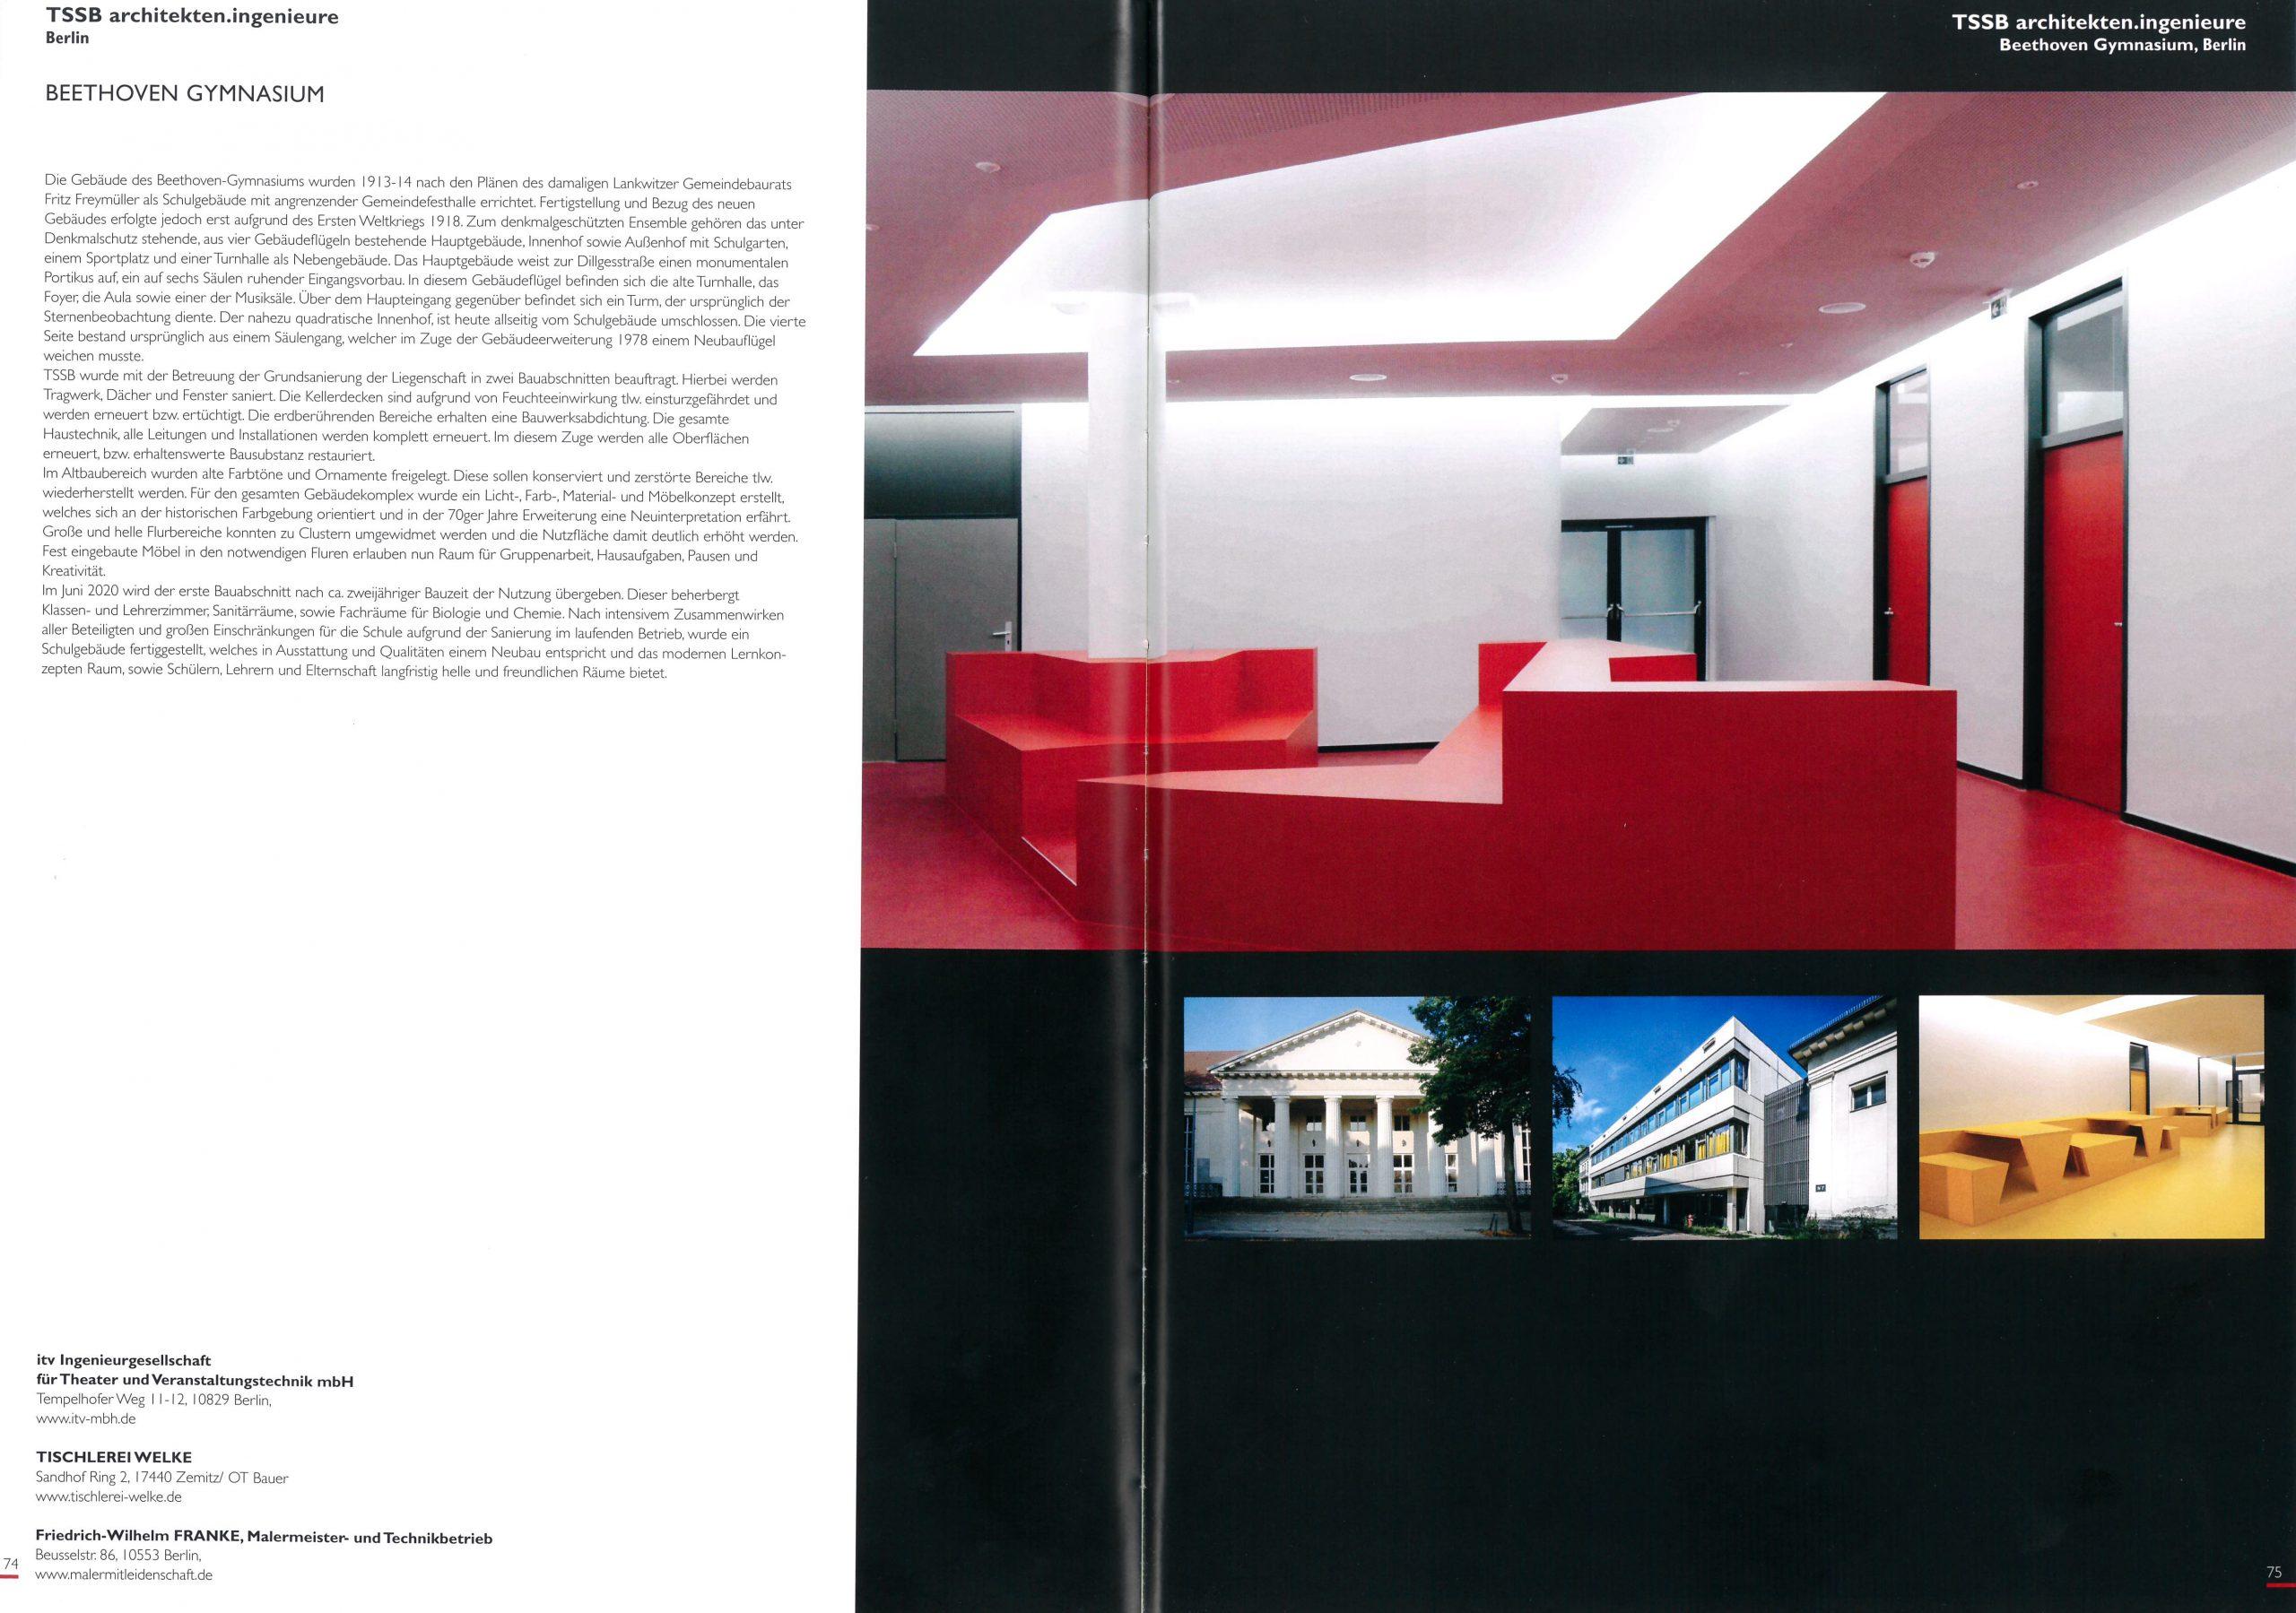 Publikation Architektur Berlin 2020